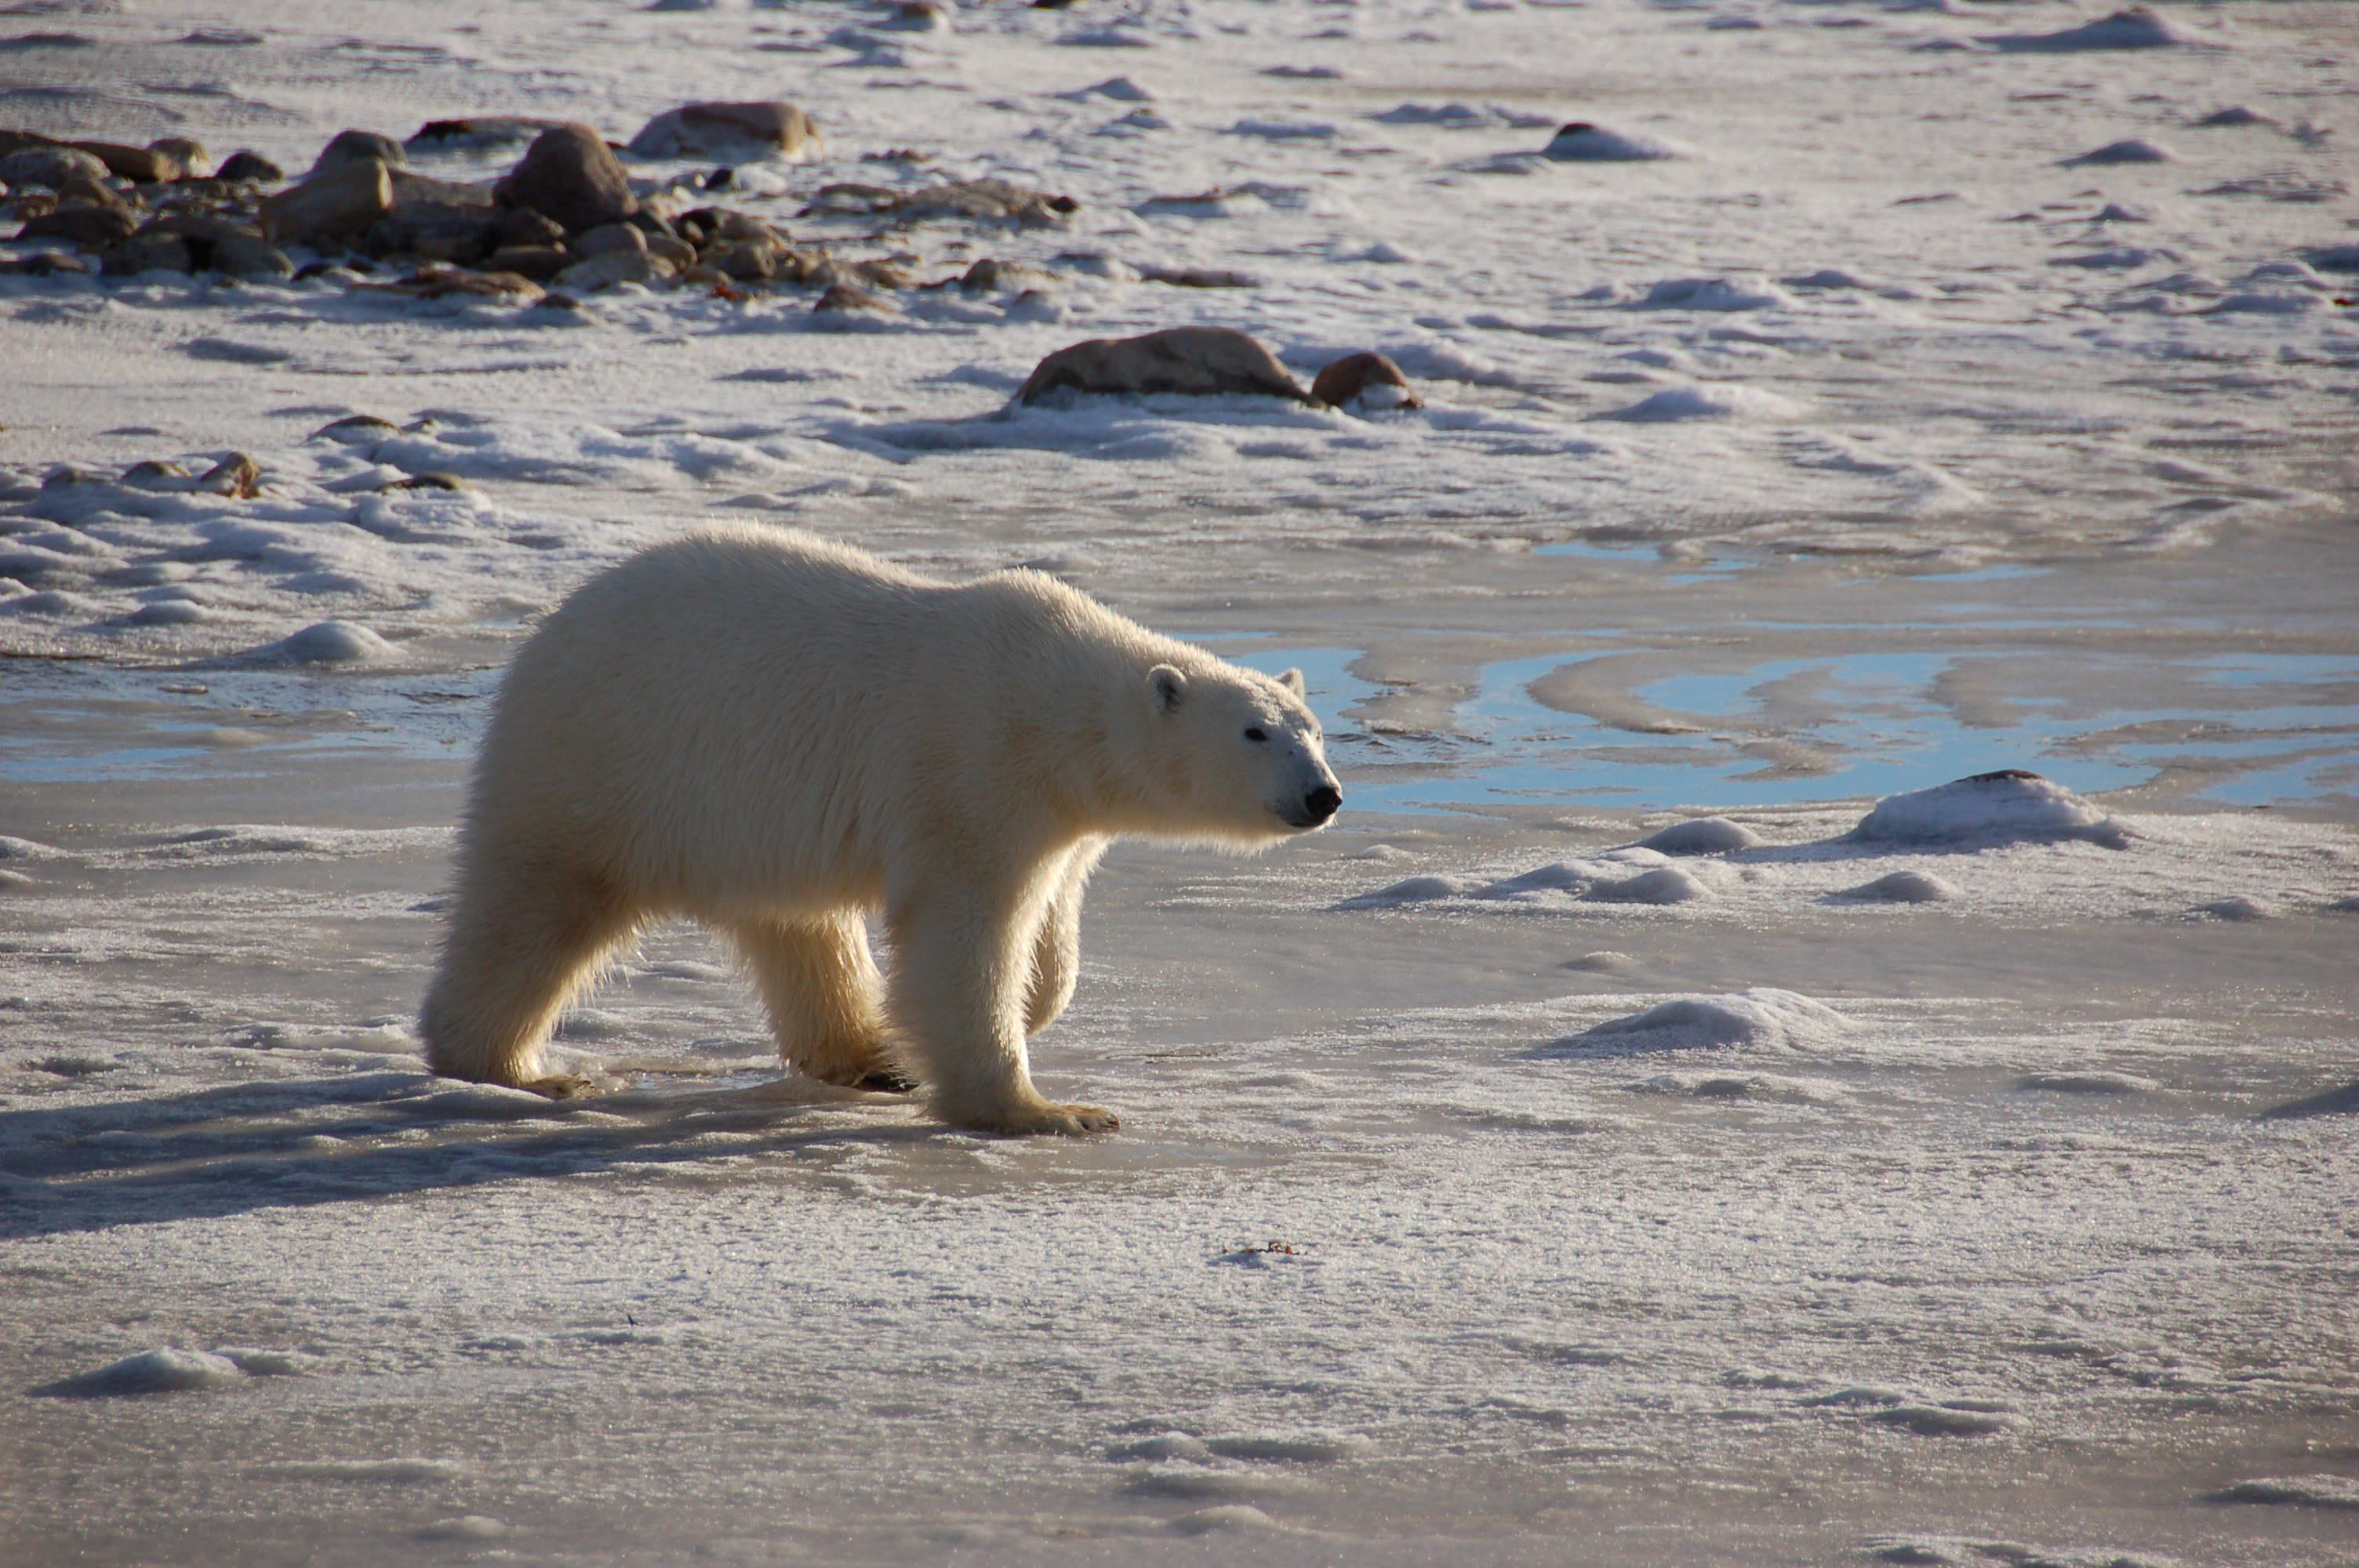 A female polar bear walks in the tidal area along Canadas Hudson Bay in autumn 2010, waiting for ice to form. (Credit: Steven C. Amstrup, Polar Bears International)